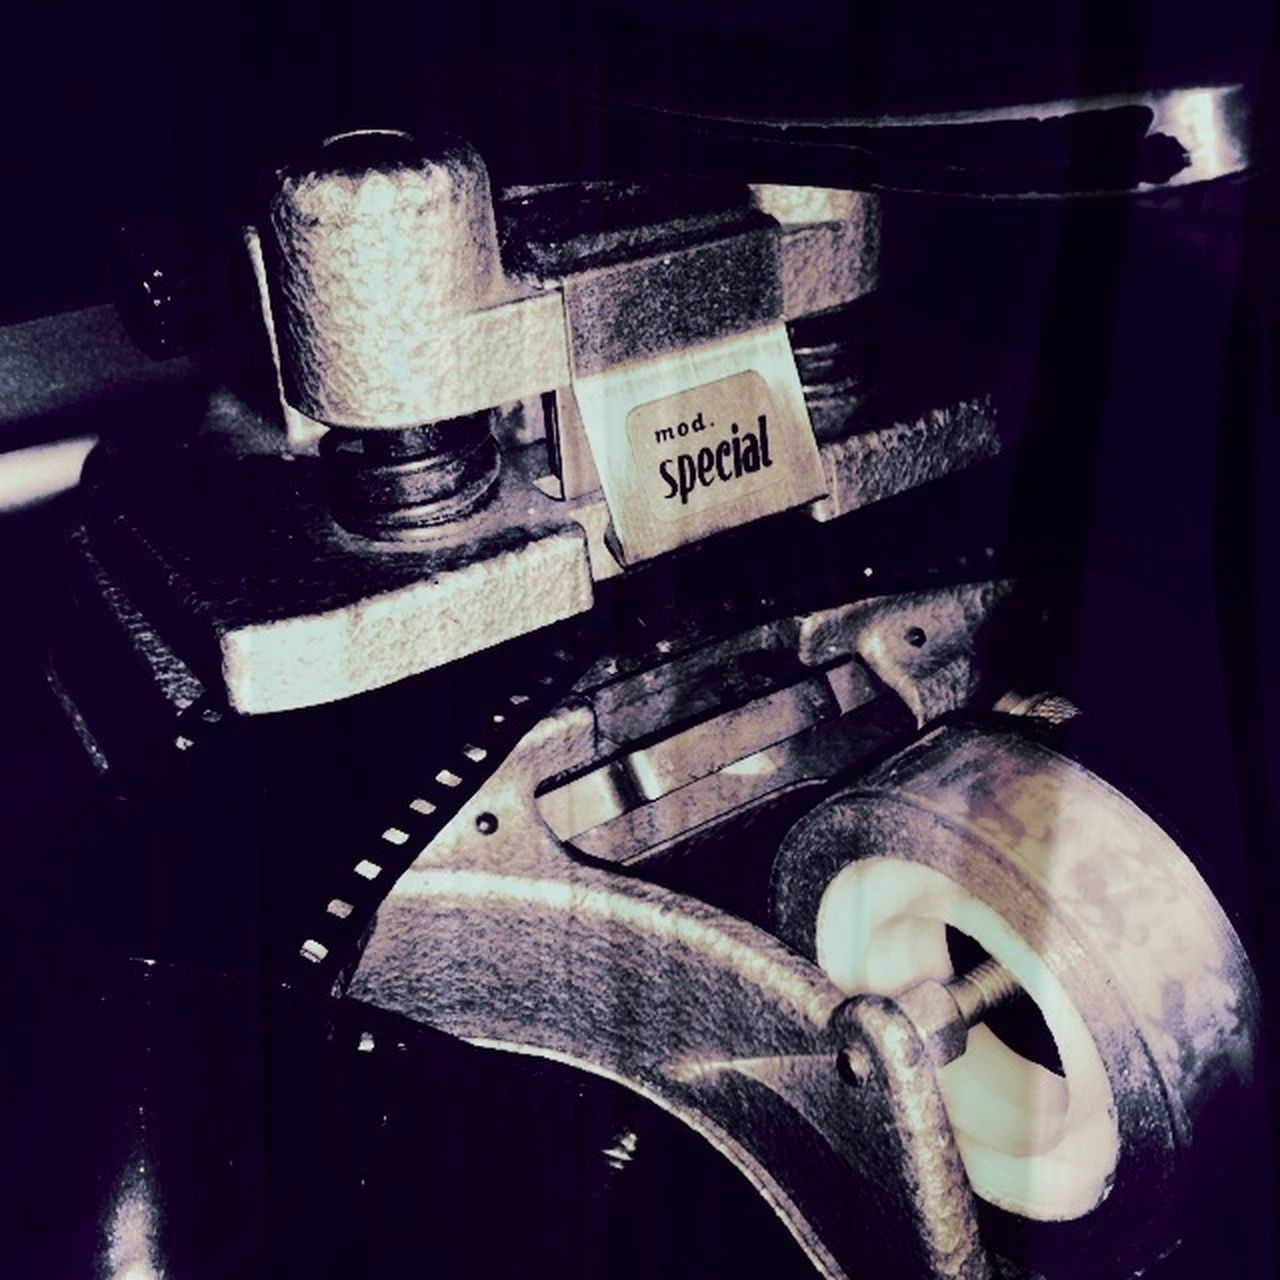 Film cutter Film Cinema Cinematography Pellicola 35mm Film Lieblingsteil Editing Editor Montaggio